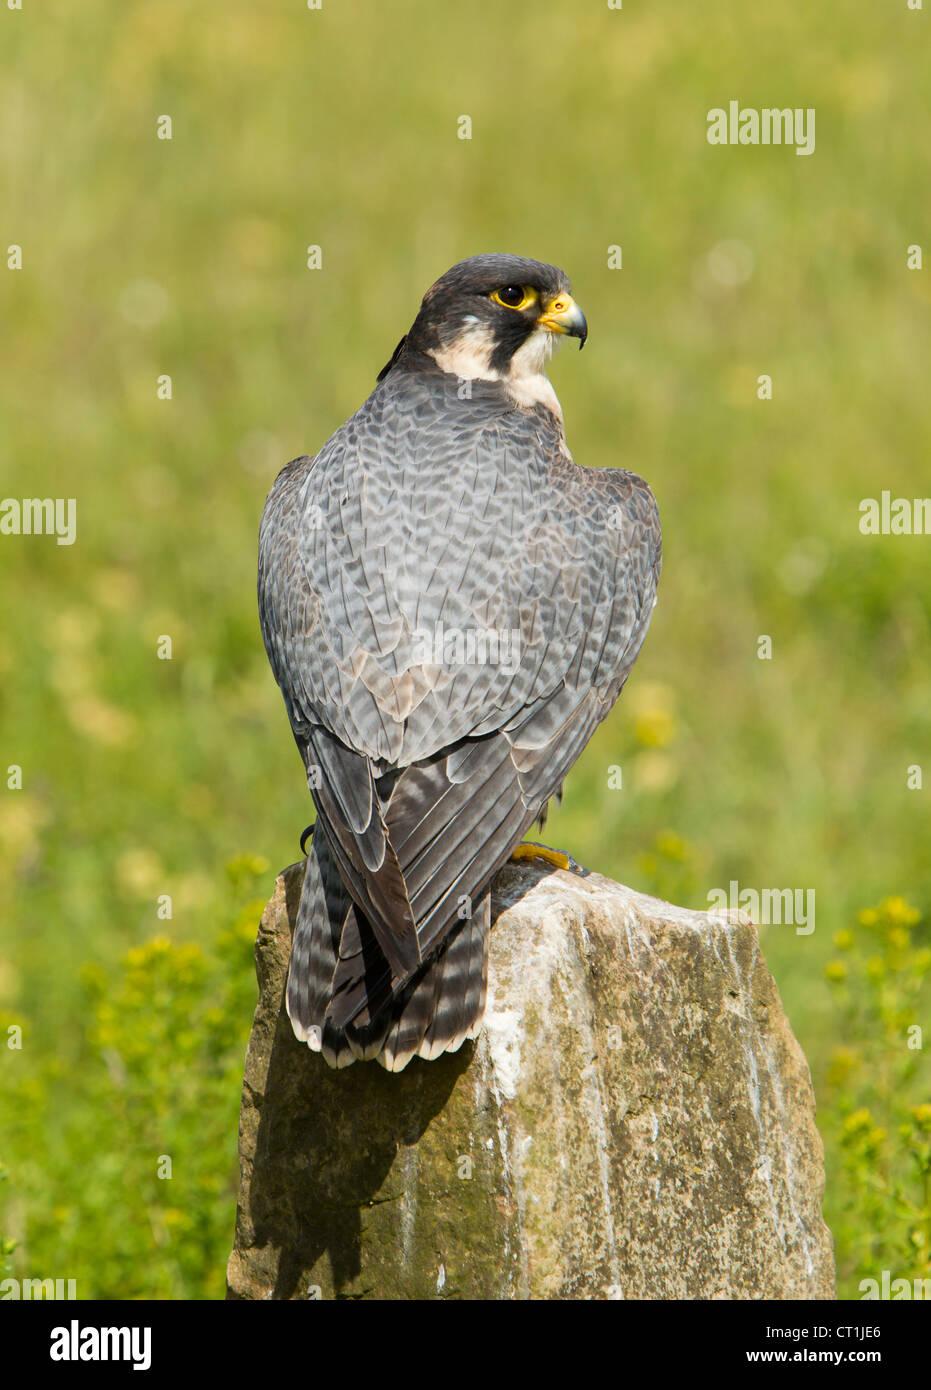 Peregrine Falcon Falco peregrinus captive shot at Hawk Conservancy Trust, Andover in June. - Stock Image